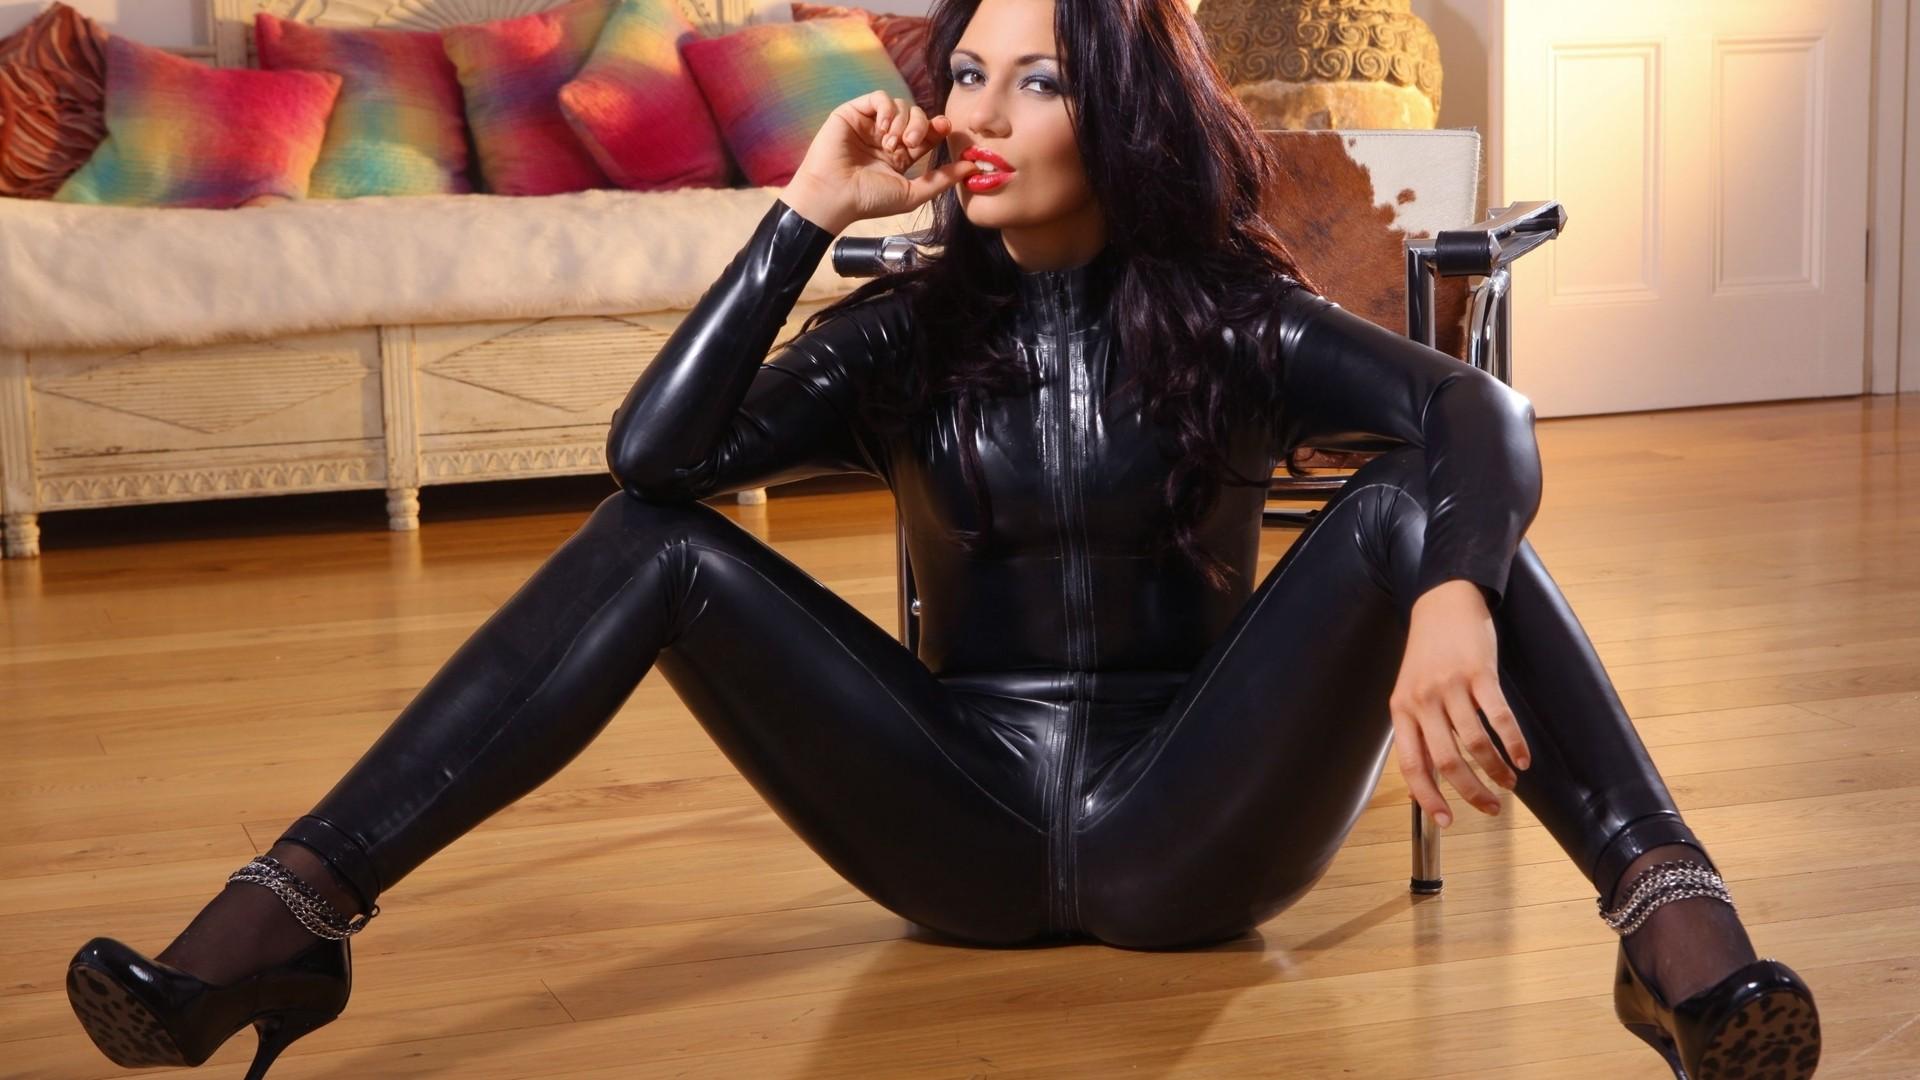 People 1920x1080 model women catsuit latex black latex spread legs sitting